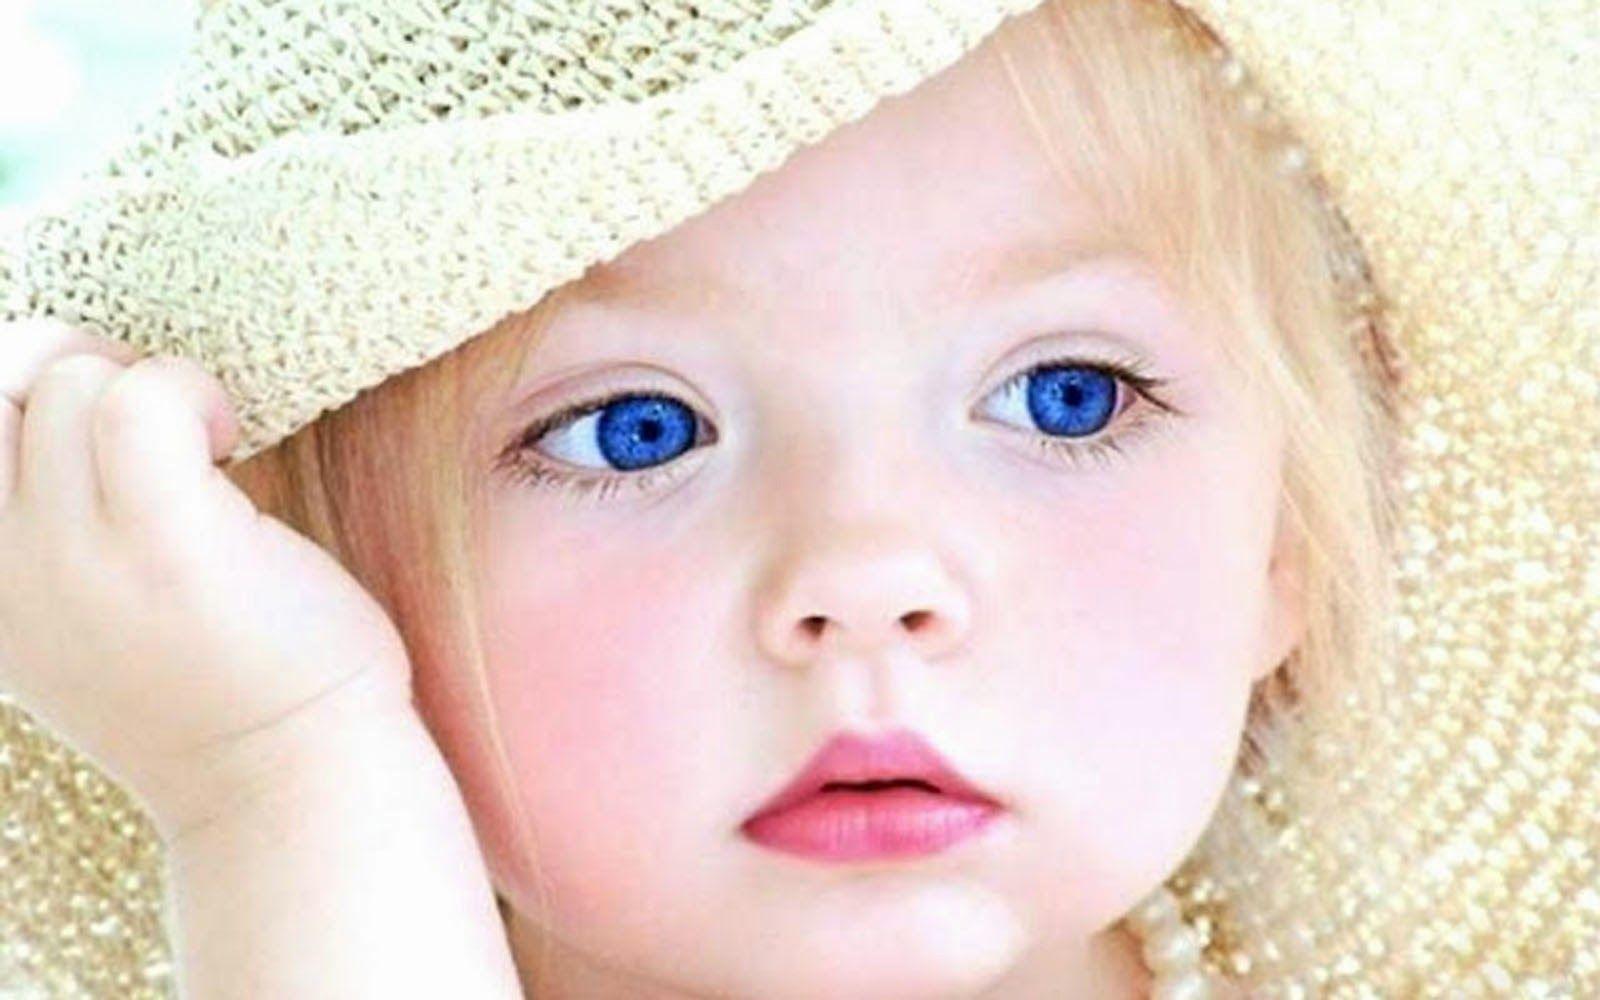 Cute baby pic  Baby girl wallpaper, Bebês loiros, Crianças lindas